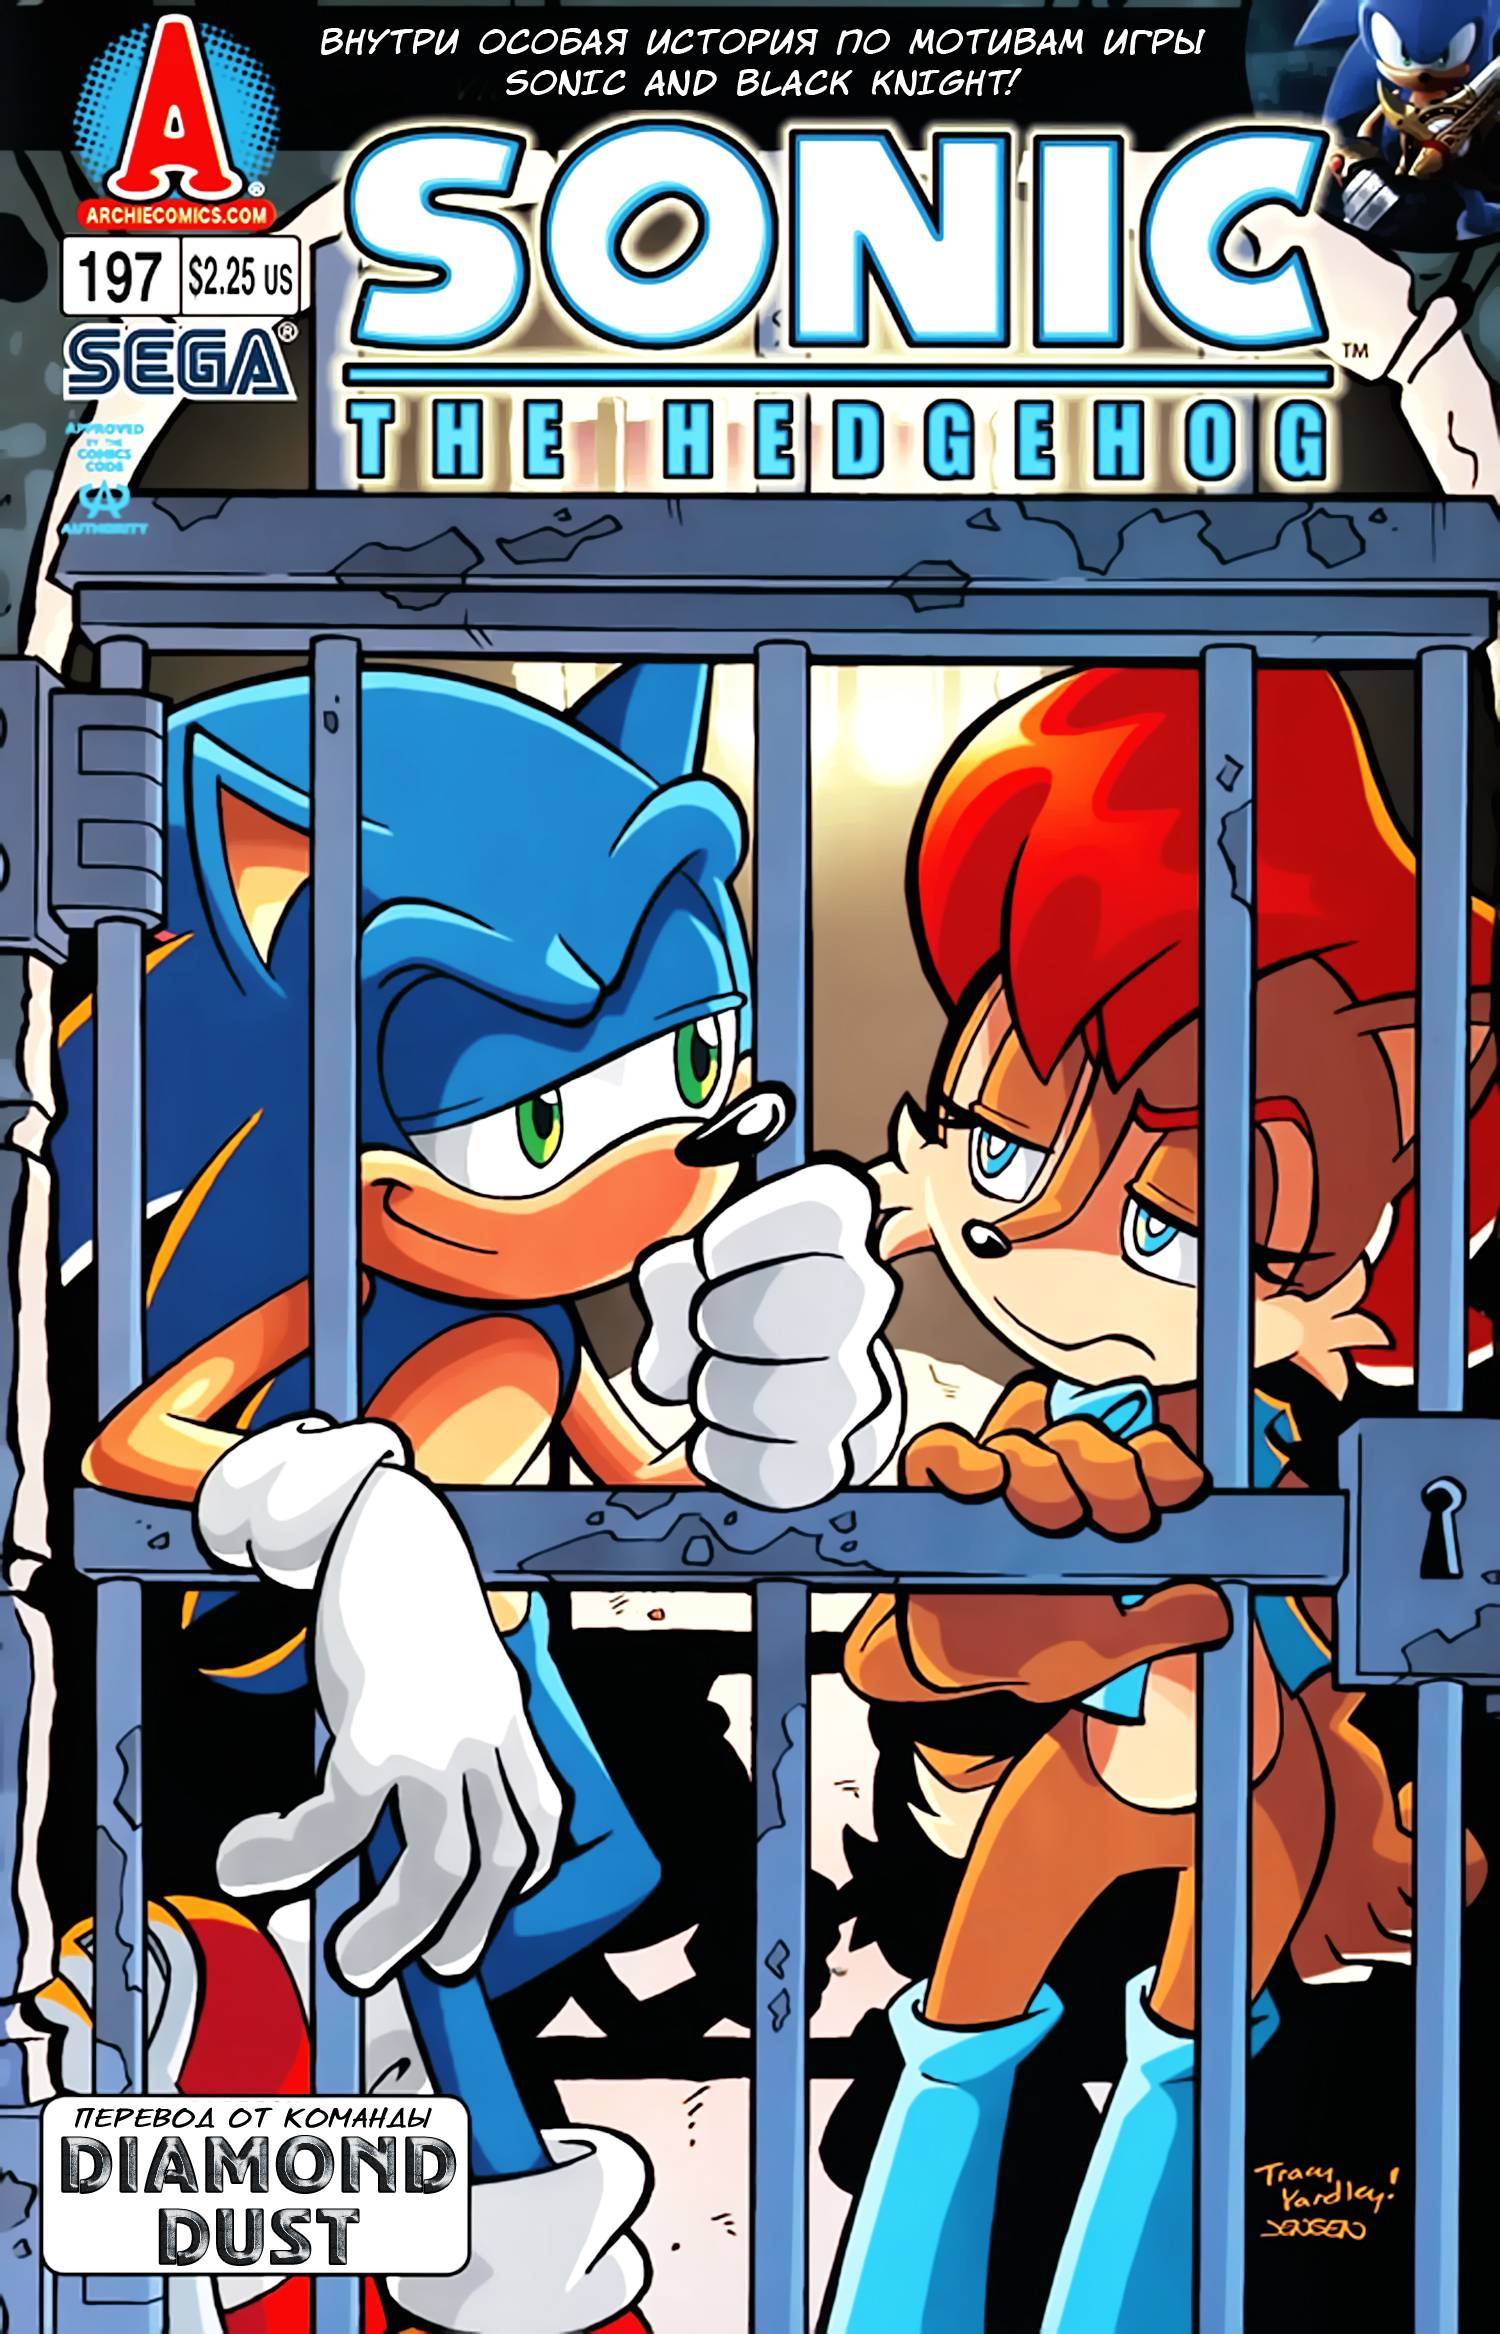 Sonic the hedgehog pron porn scenes